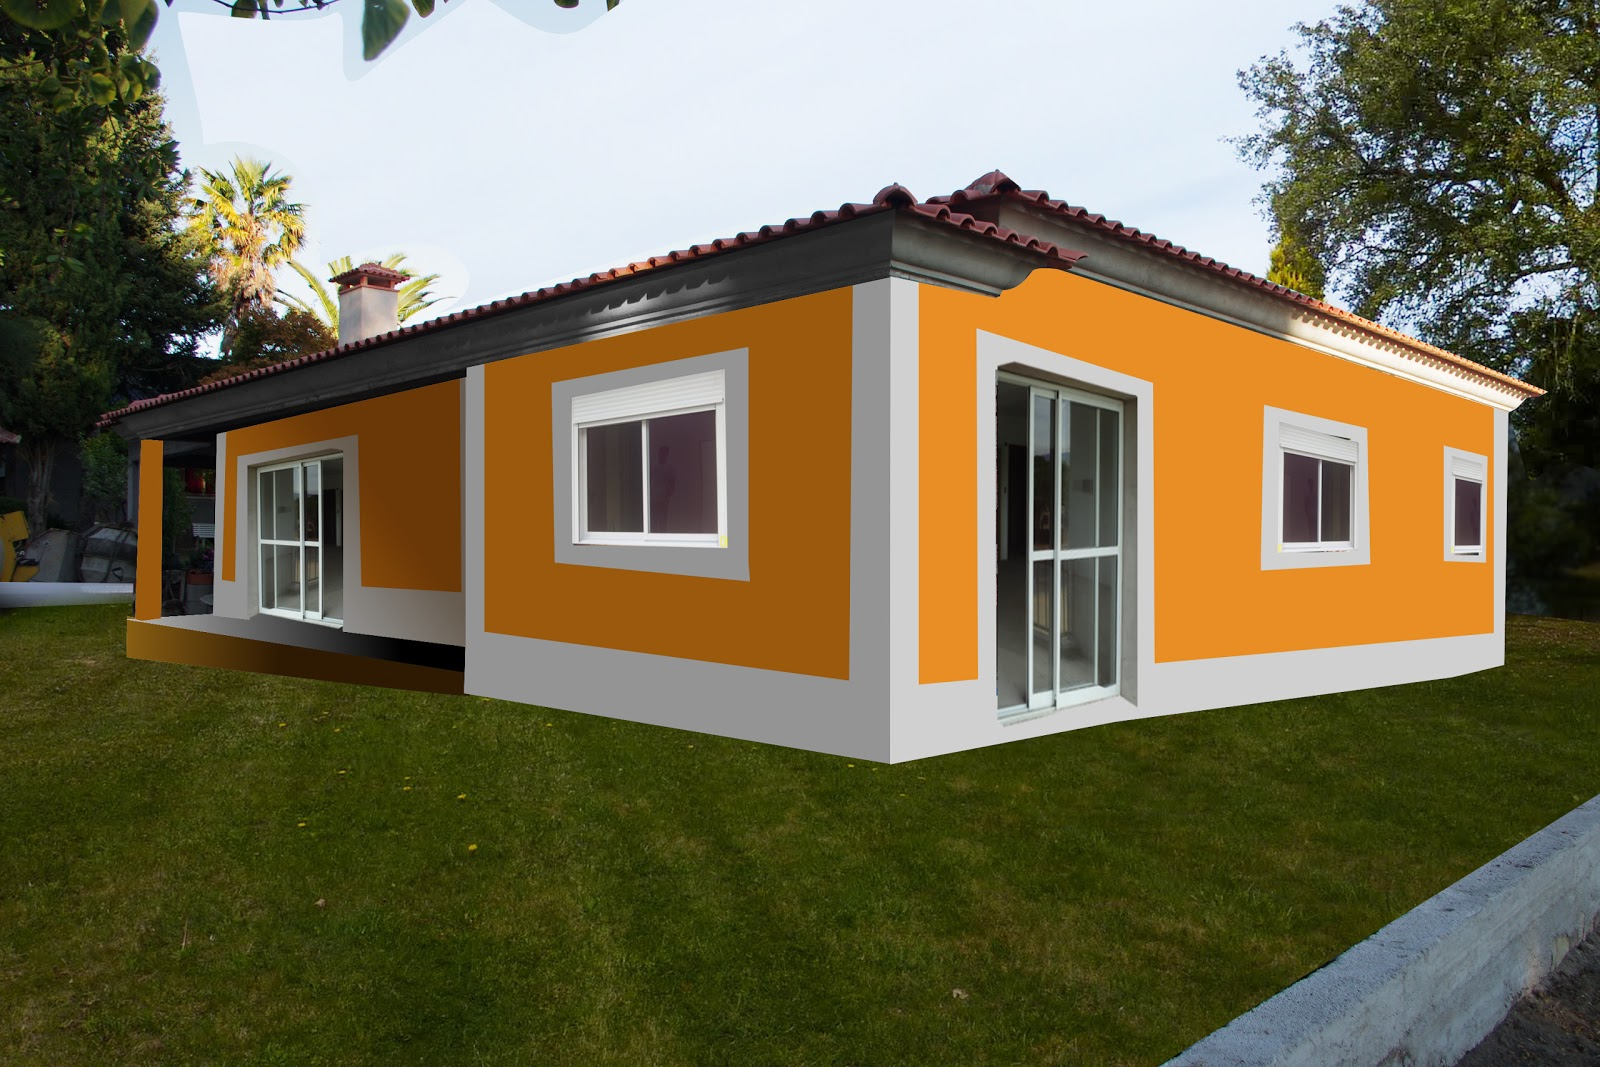 Di rio da nossa casa images frompo - Colores para pintar una casa interior ...